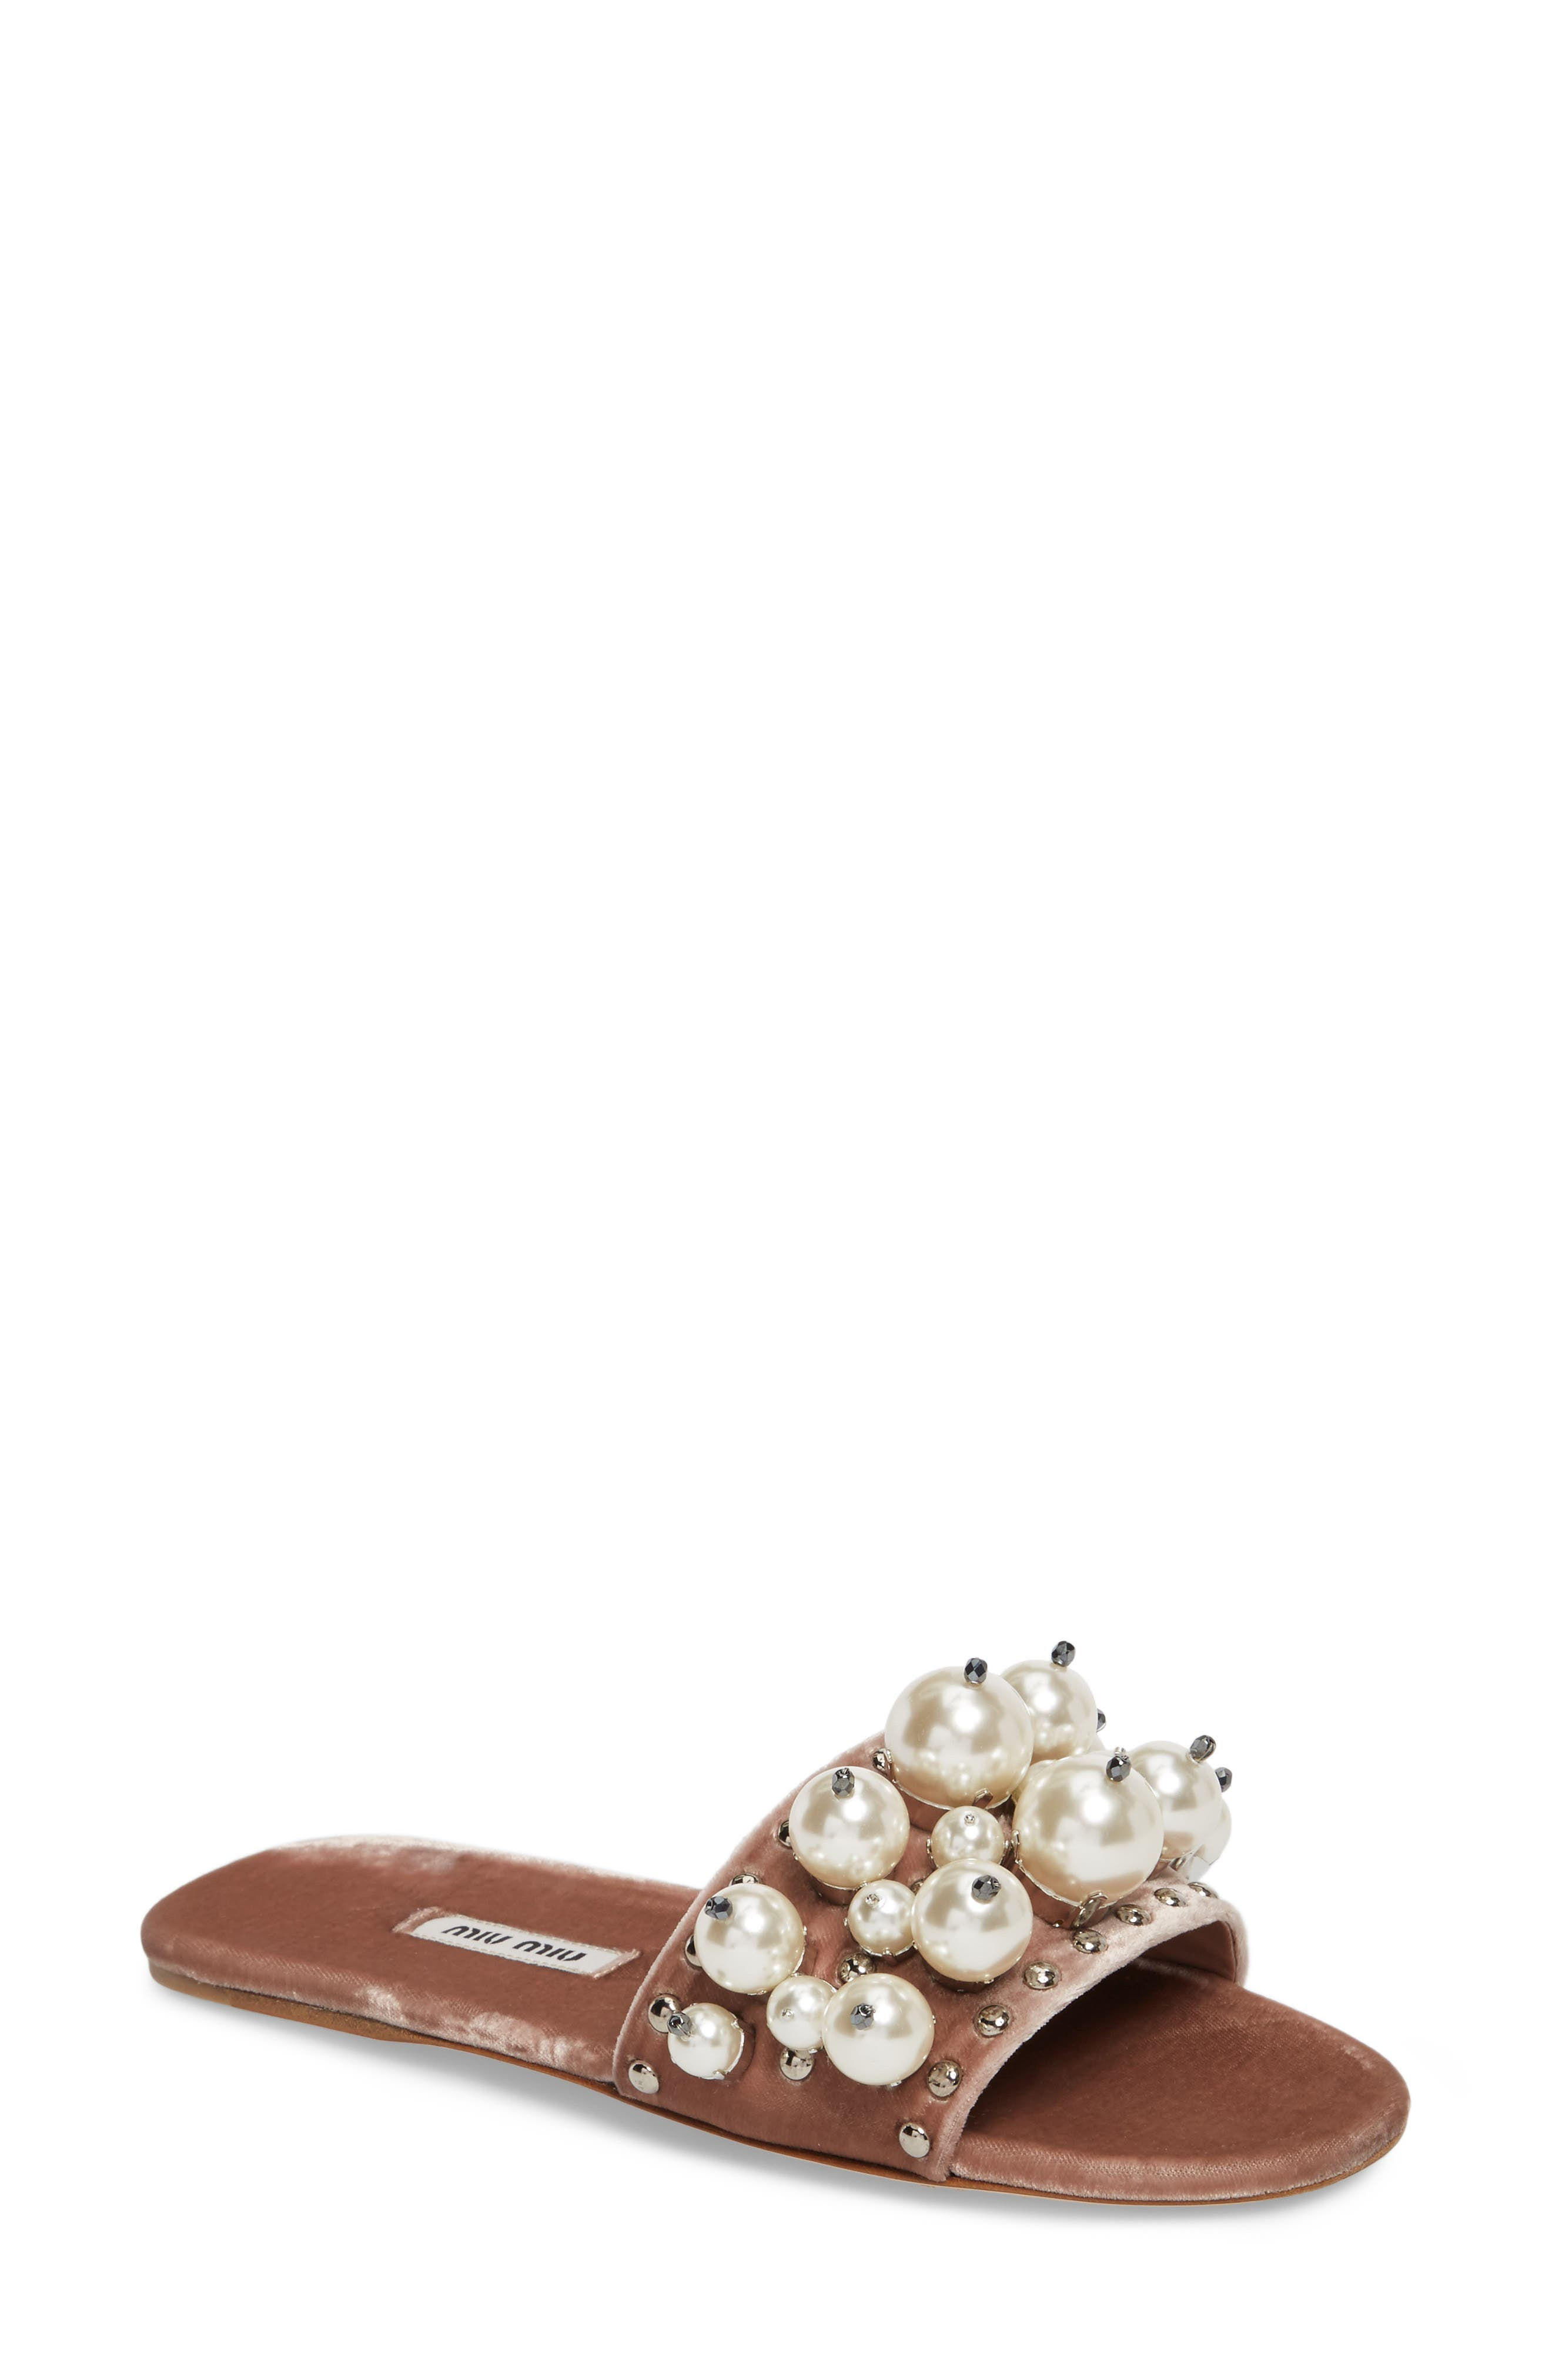 Miu Miu Imitation Pearl Embellished Slide Sandal (Women)